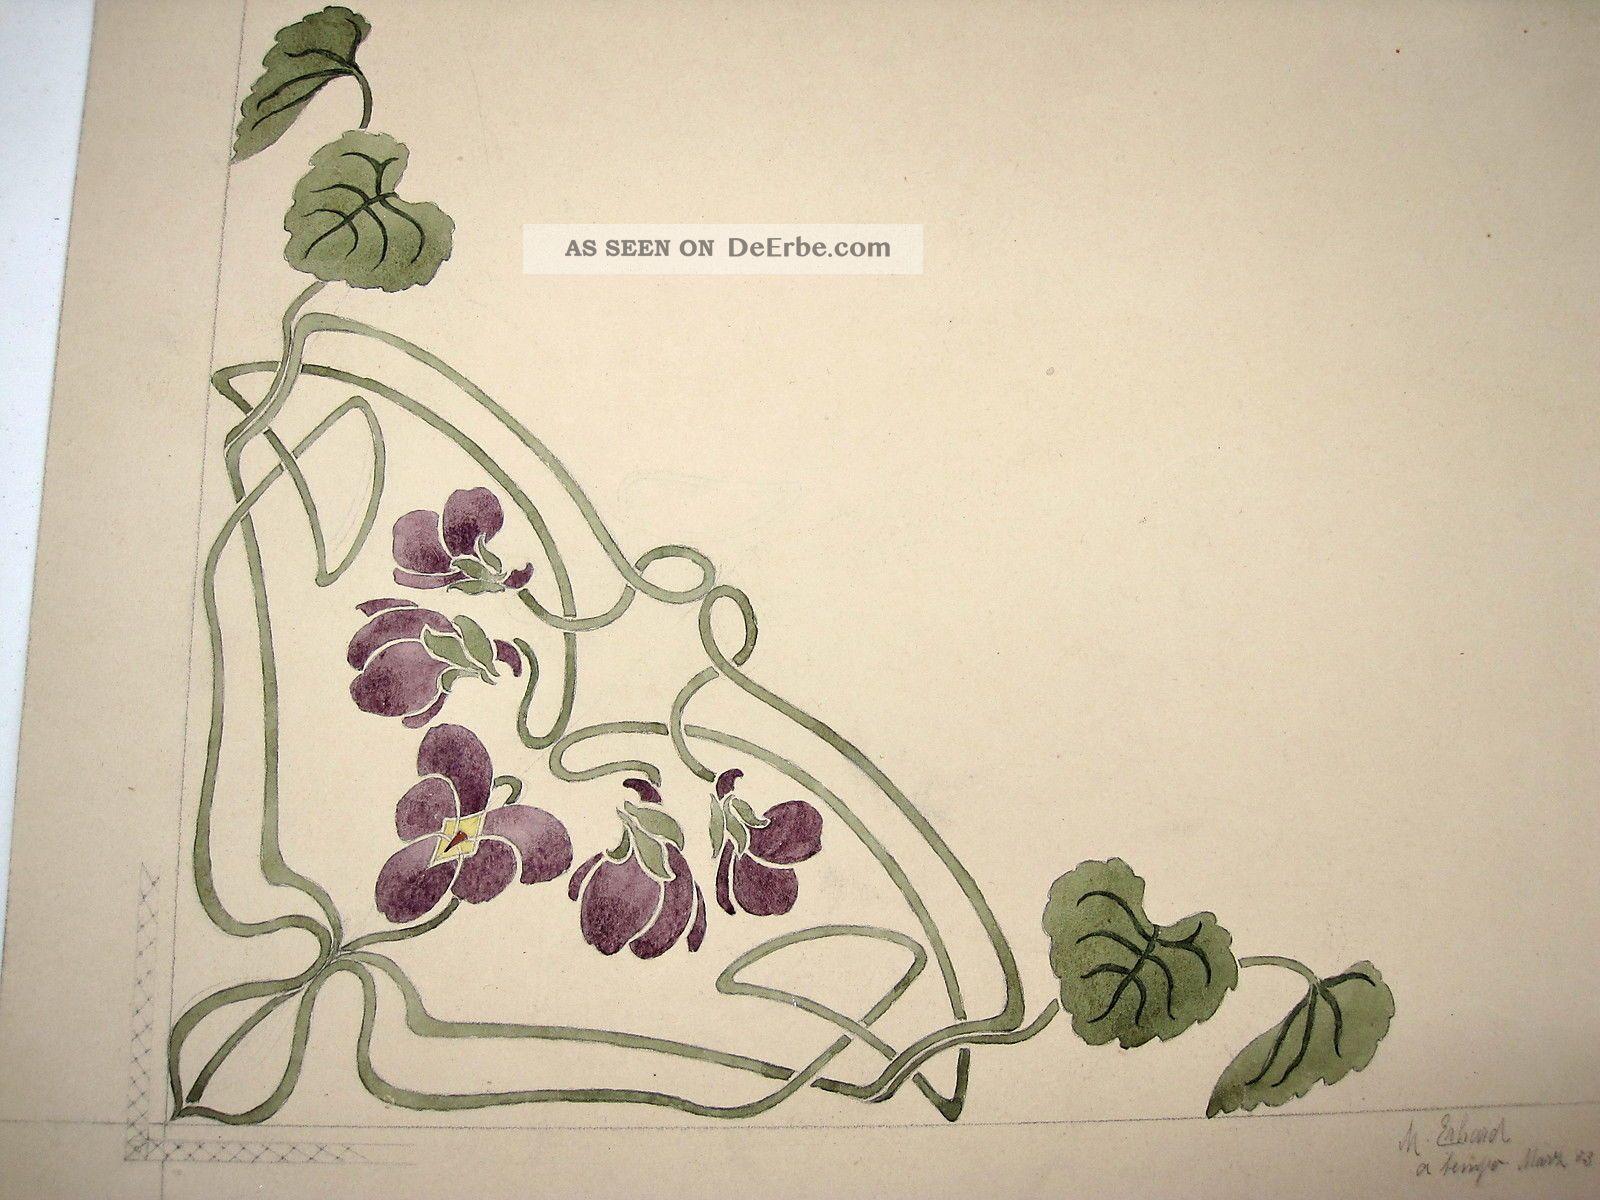 SchÖn Jugendstil Zeichnung 1903 A.  Nachlaß 1890-1919, Jugendstil Bild